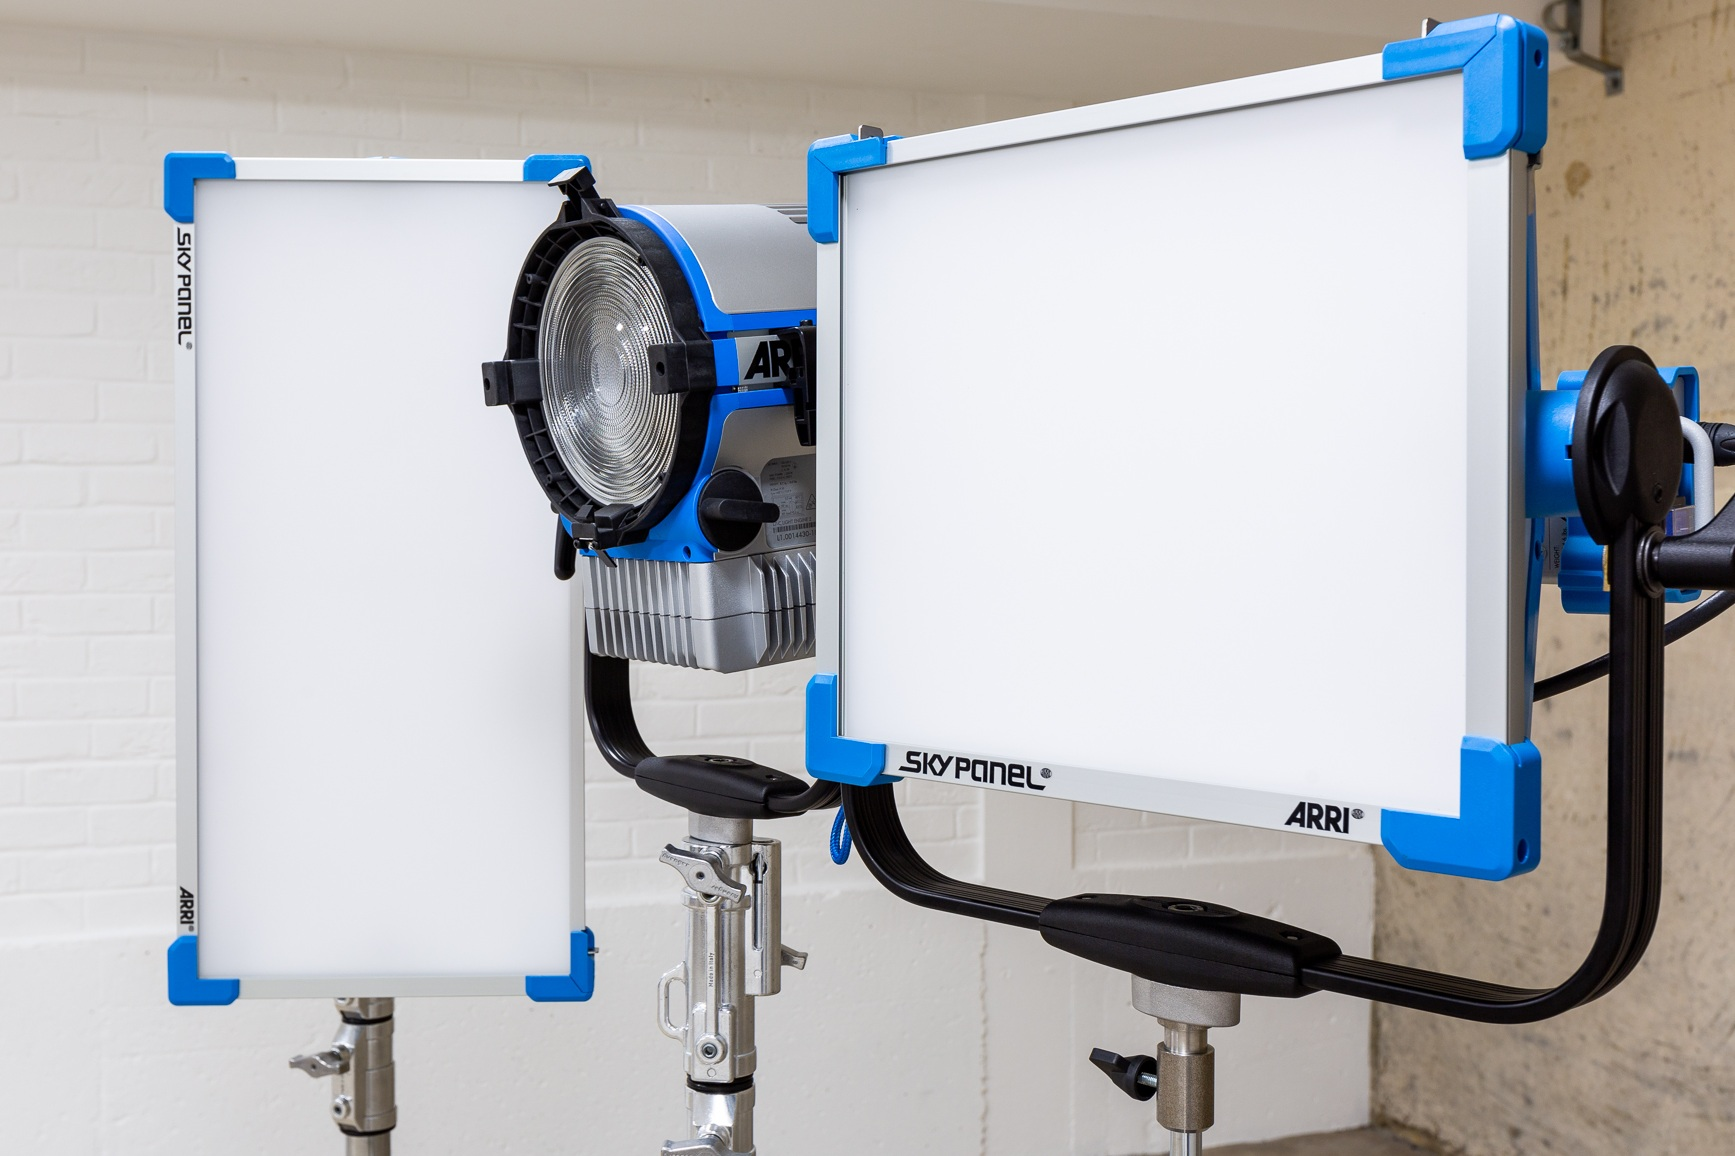 ARRI® RGBW soft and hard LED lighting. -